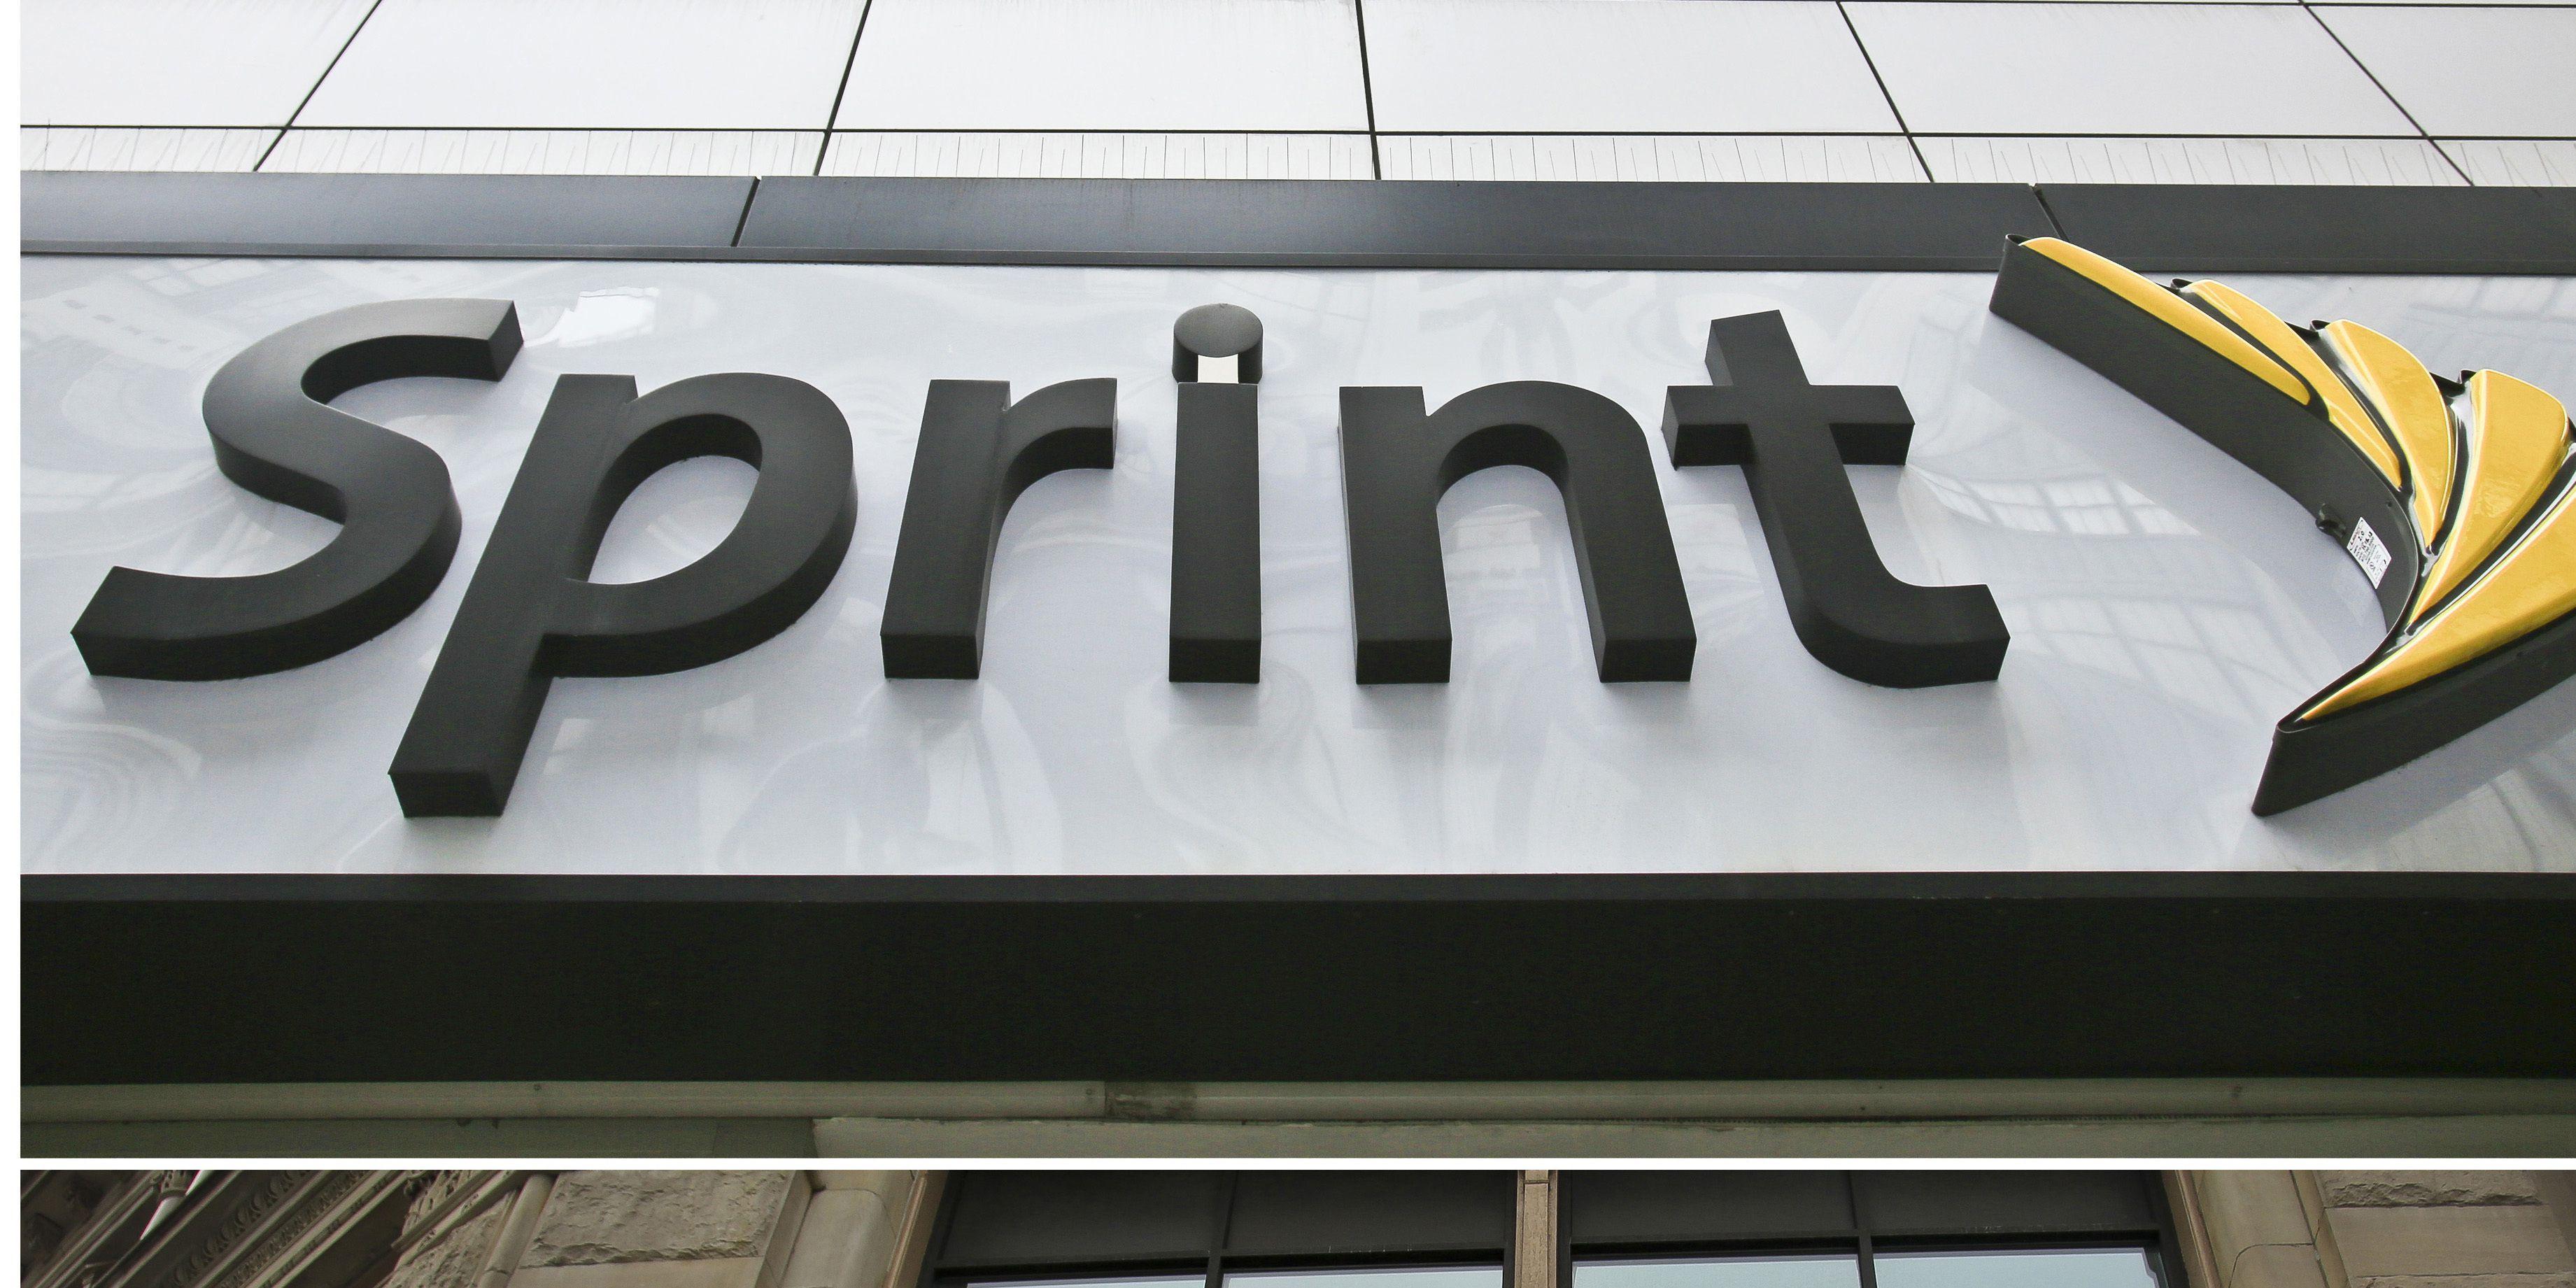 Judge clears major hurdle in T-Mobile's $26.5B Sprint bid